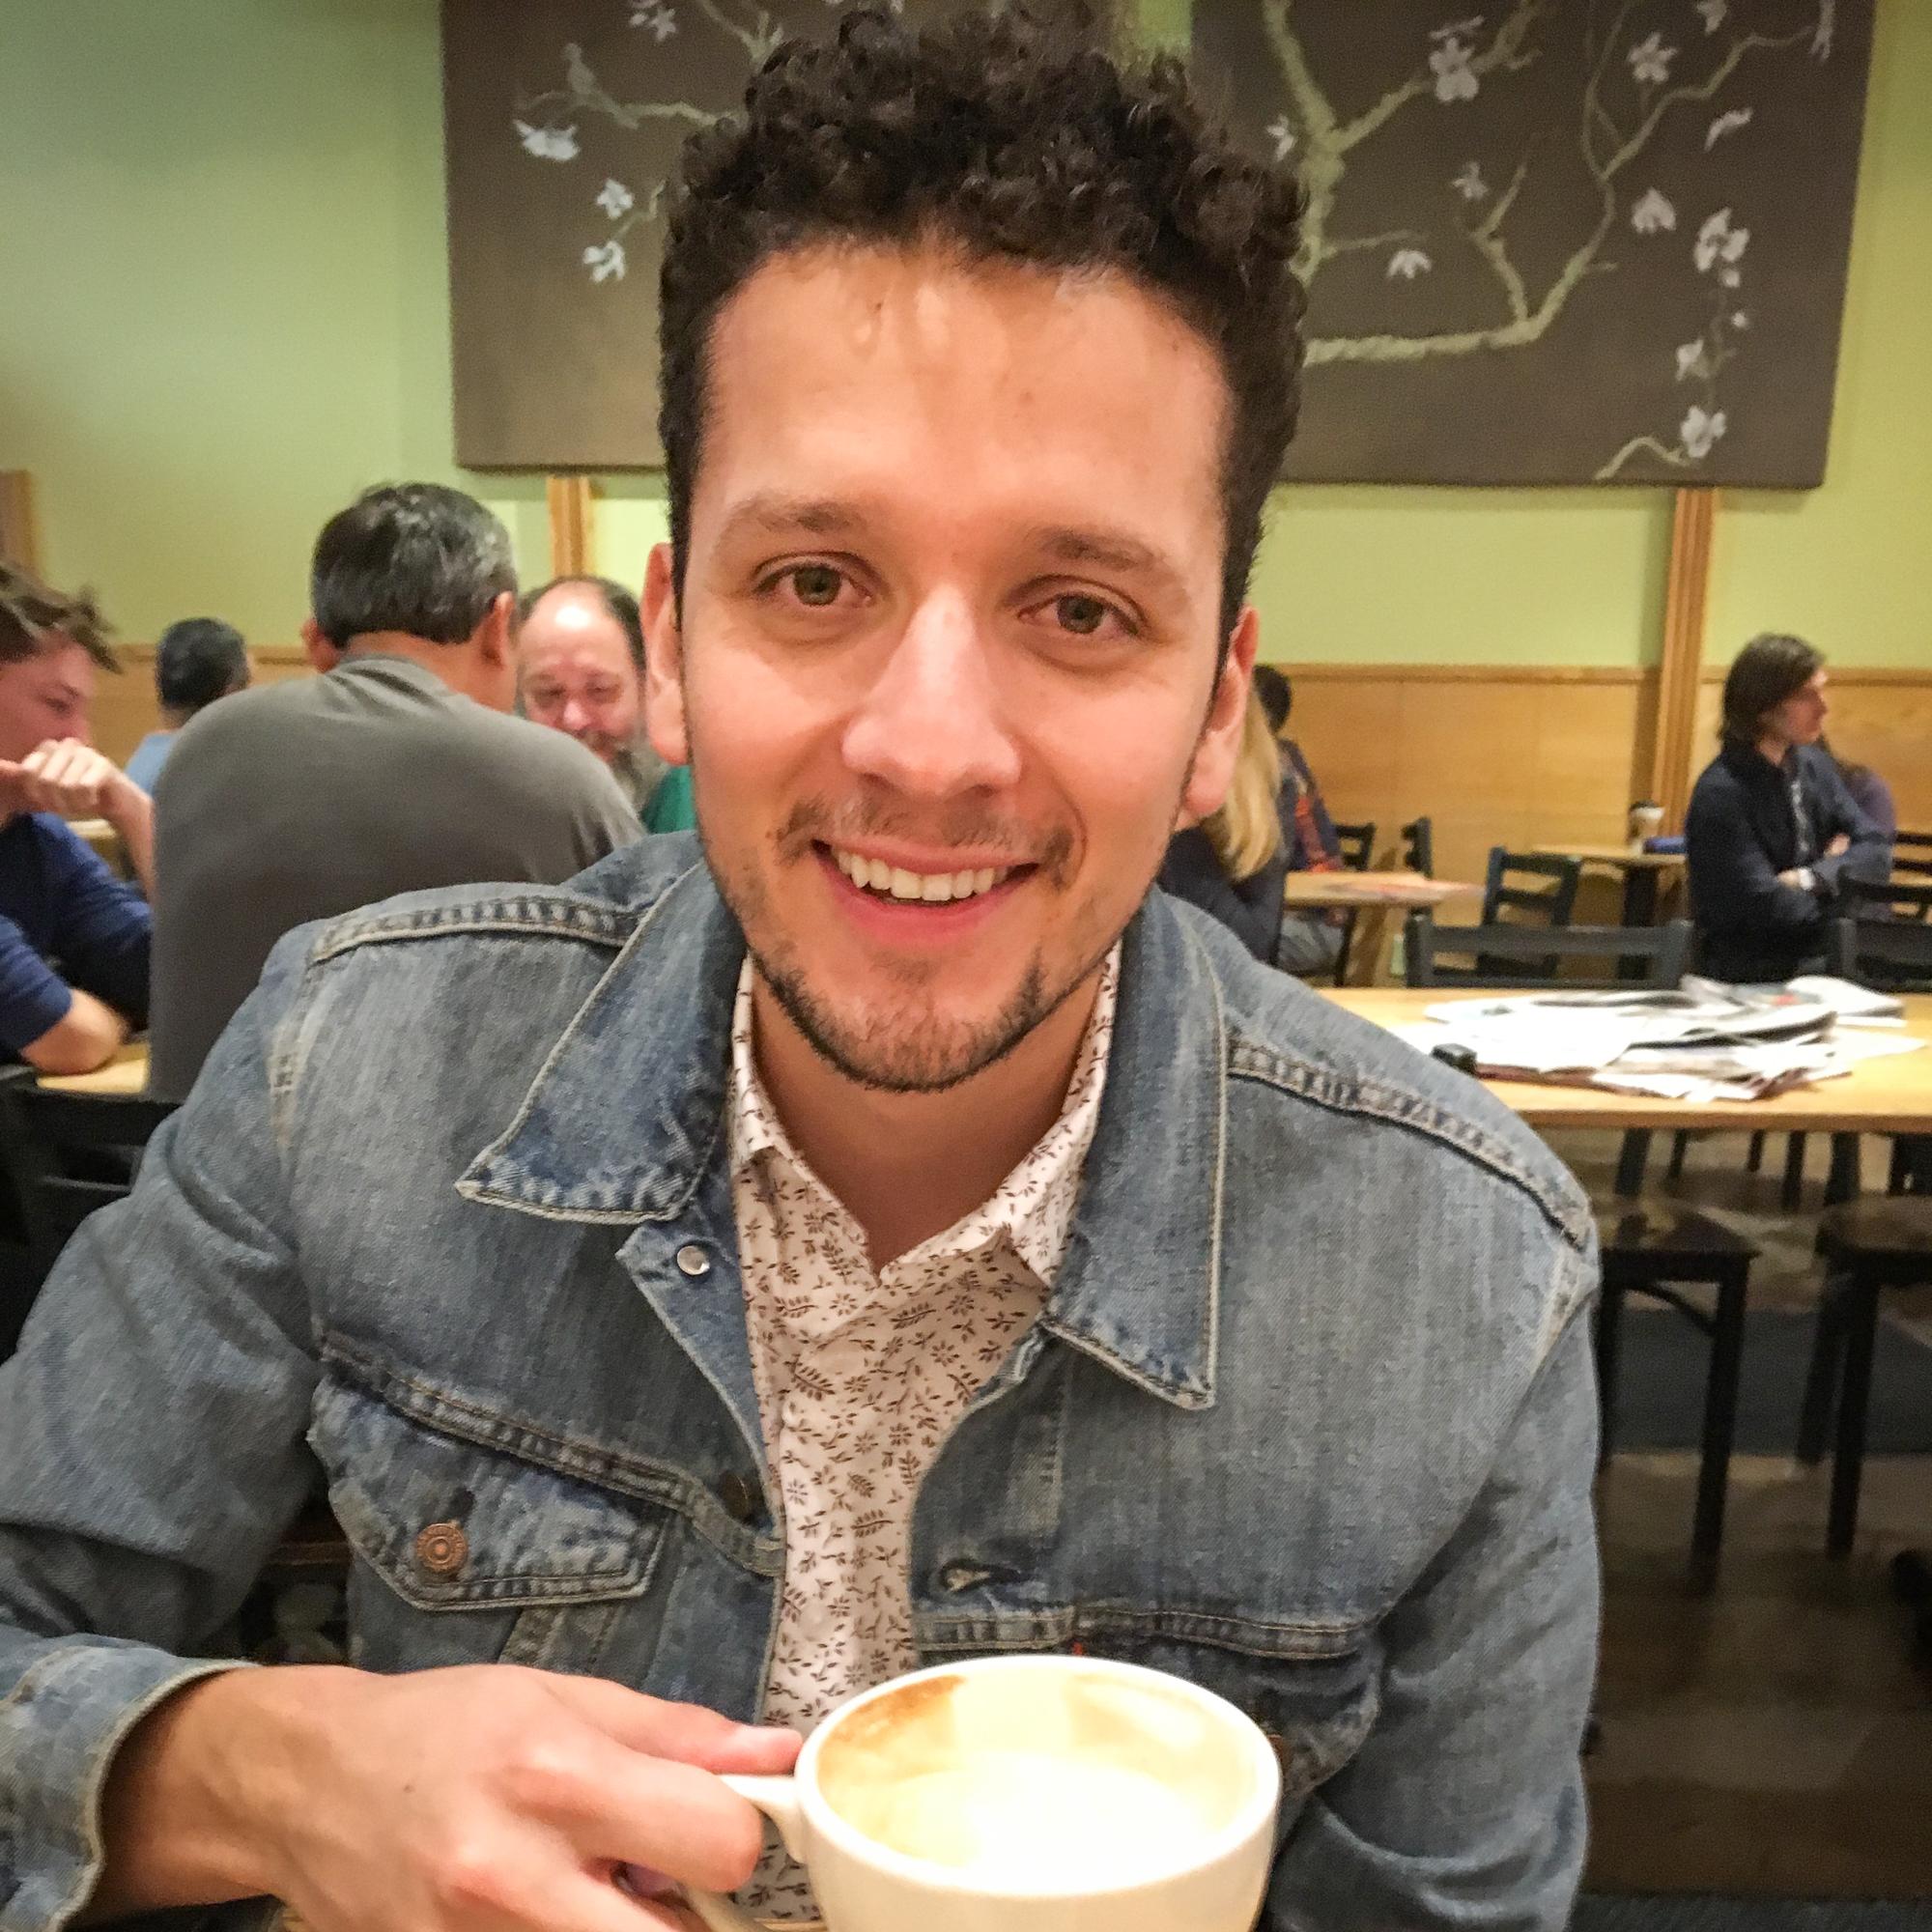 Omar Arambula, co-founder & COO of Munkee, makers of InstaSize